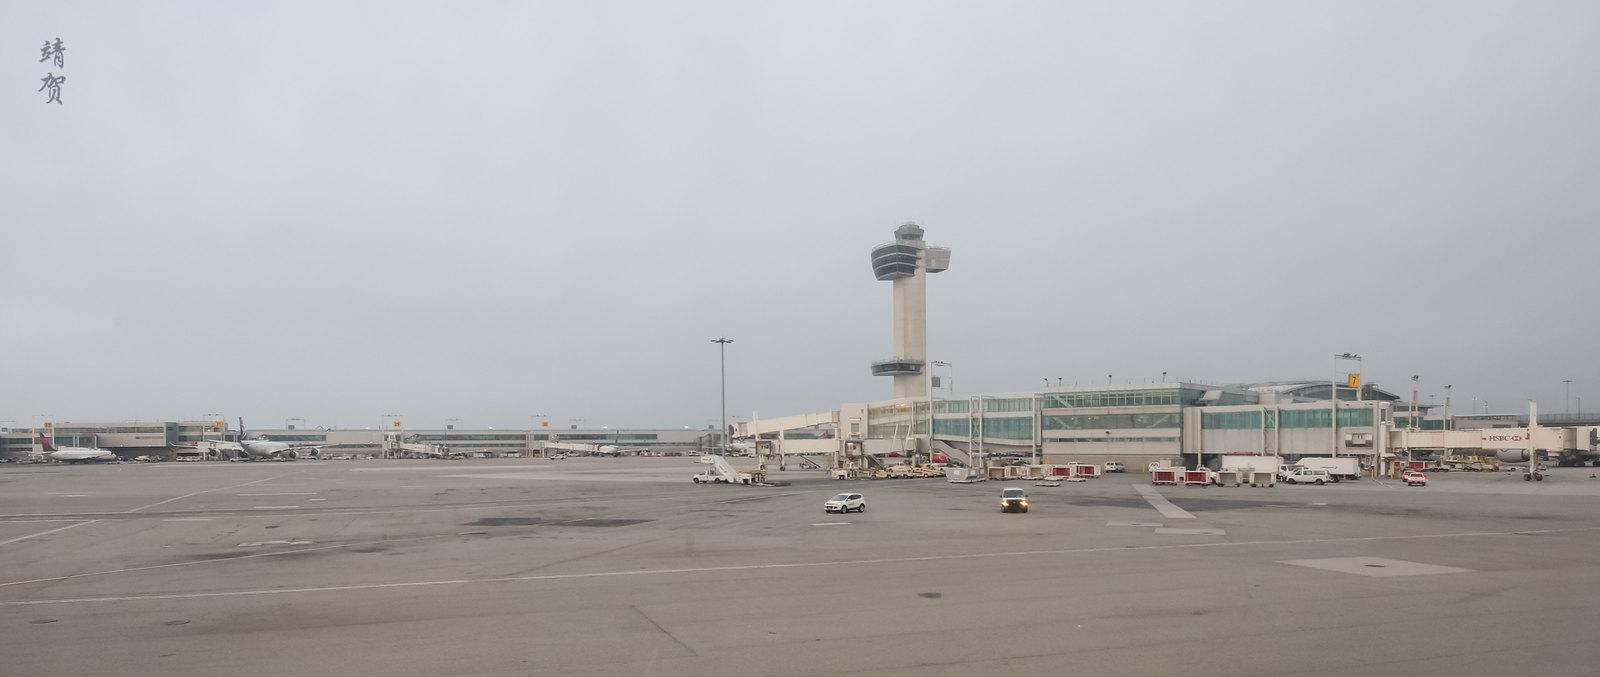 Control tower at JFK